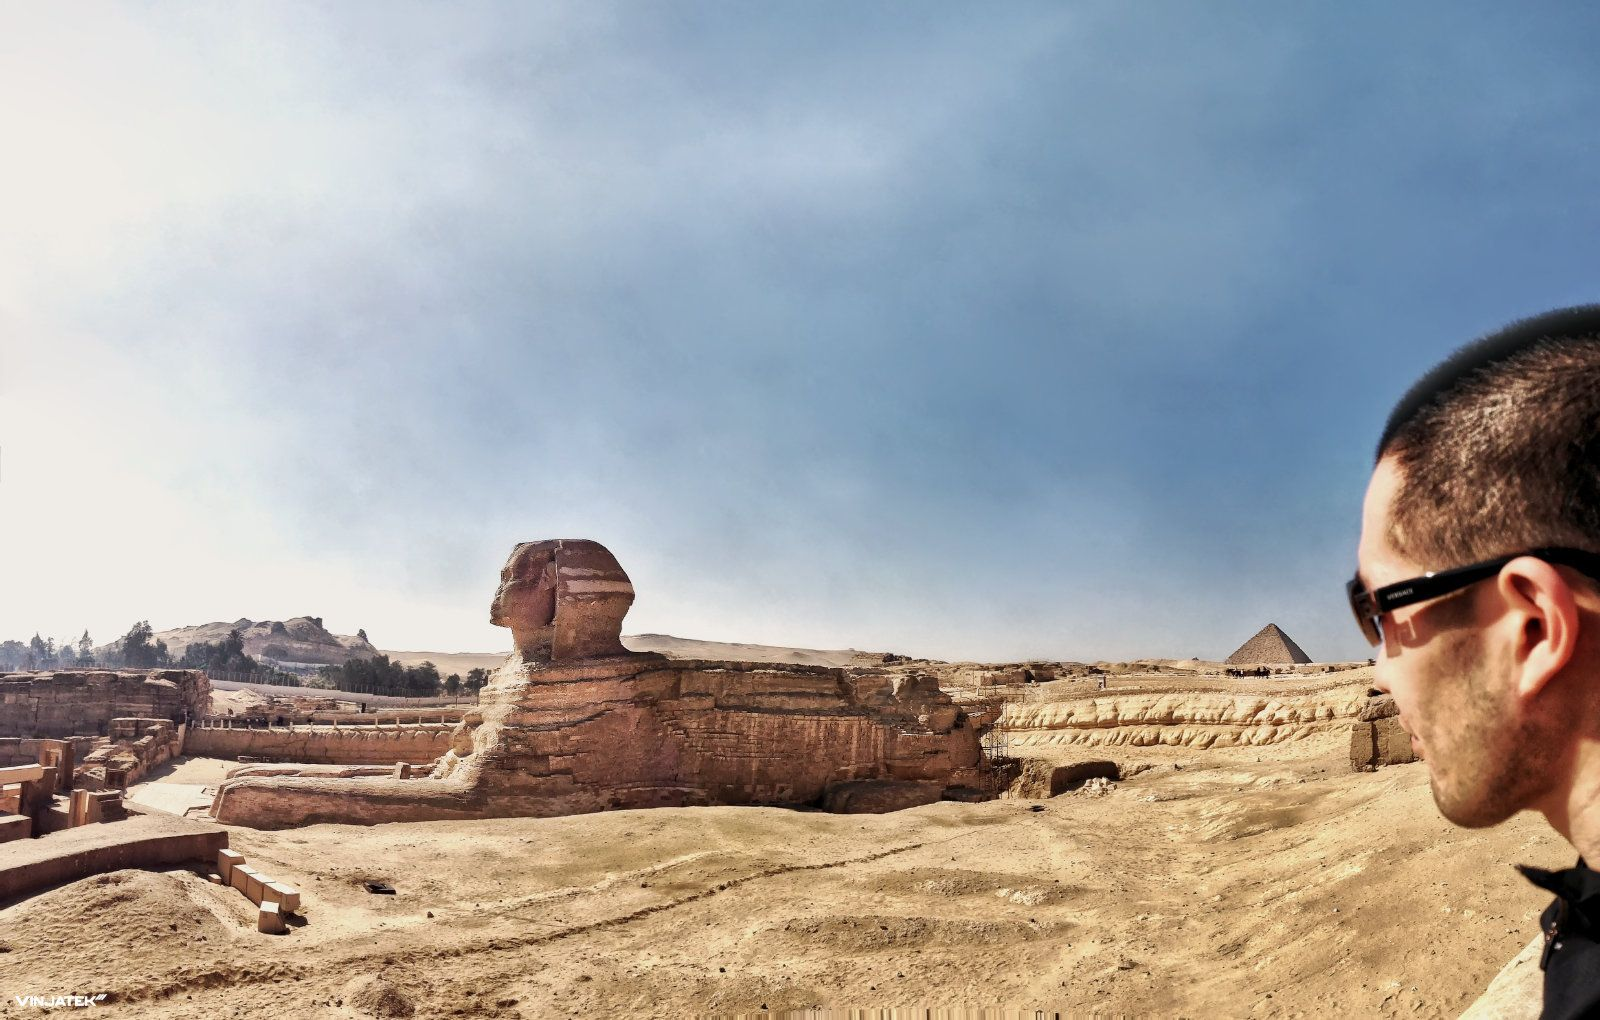 Photo The Great Sphinx of Giza Vinjatek Giza, Photo